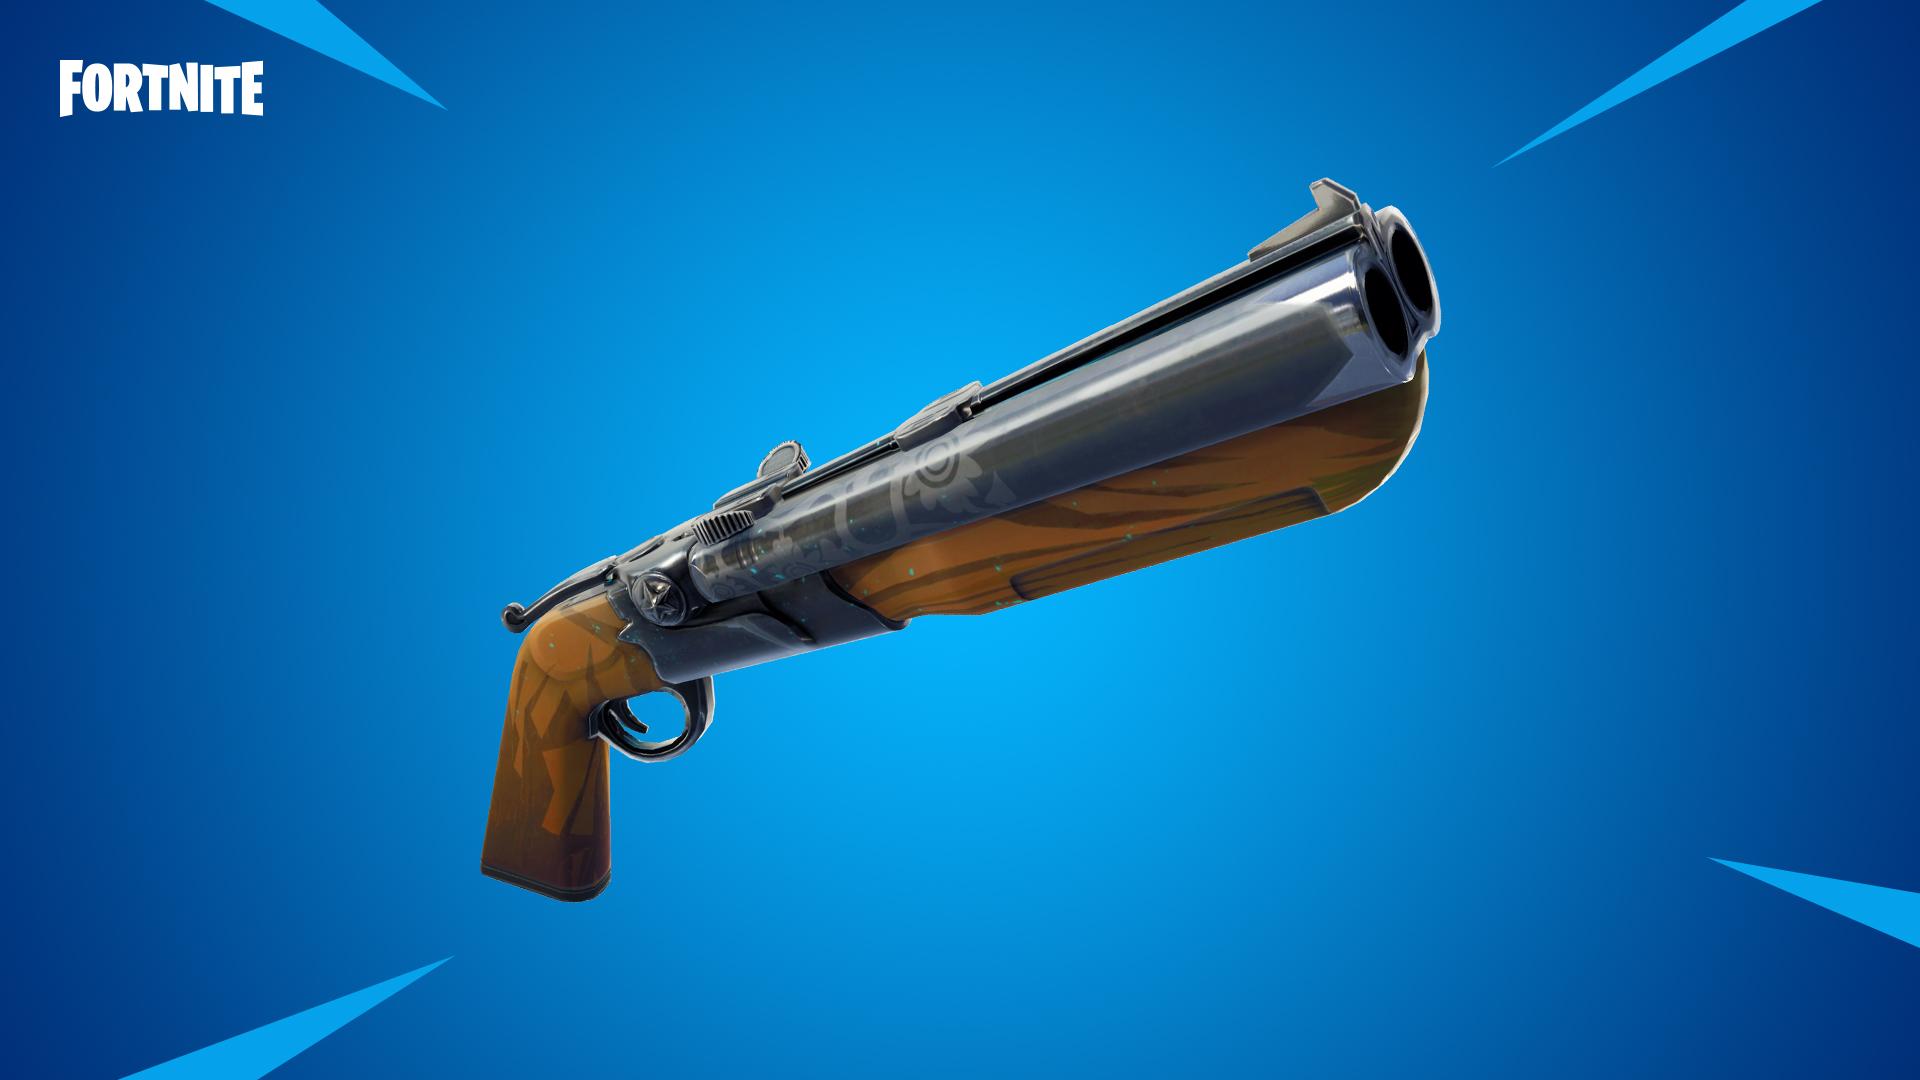 Fortnite%2Fpatch-notes%2Fv5-20%2Foverview-text-v5-20%2FBR05_Social_Double-Barrel-Shotgun-1920x1080-56a2f8b99d1274bfc3b9806862fa50cb20e1e06c.jpg